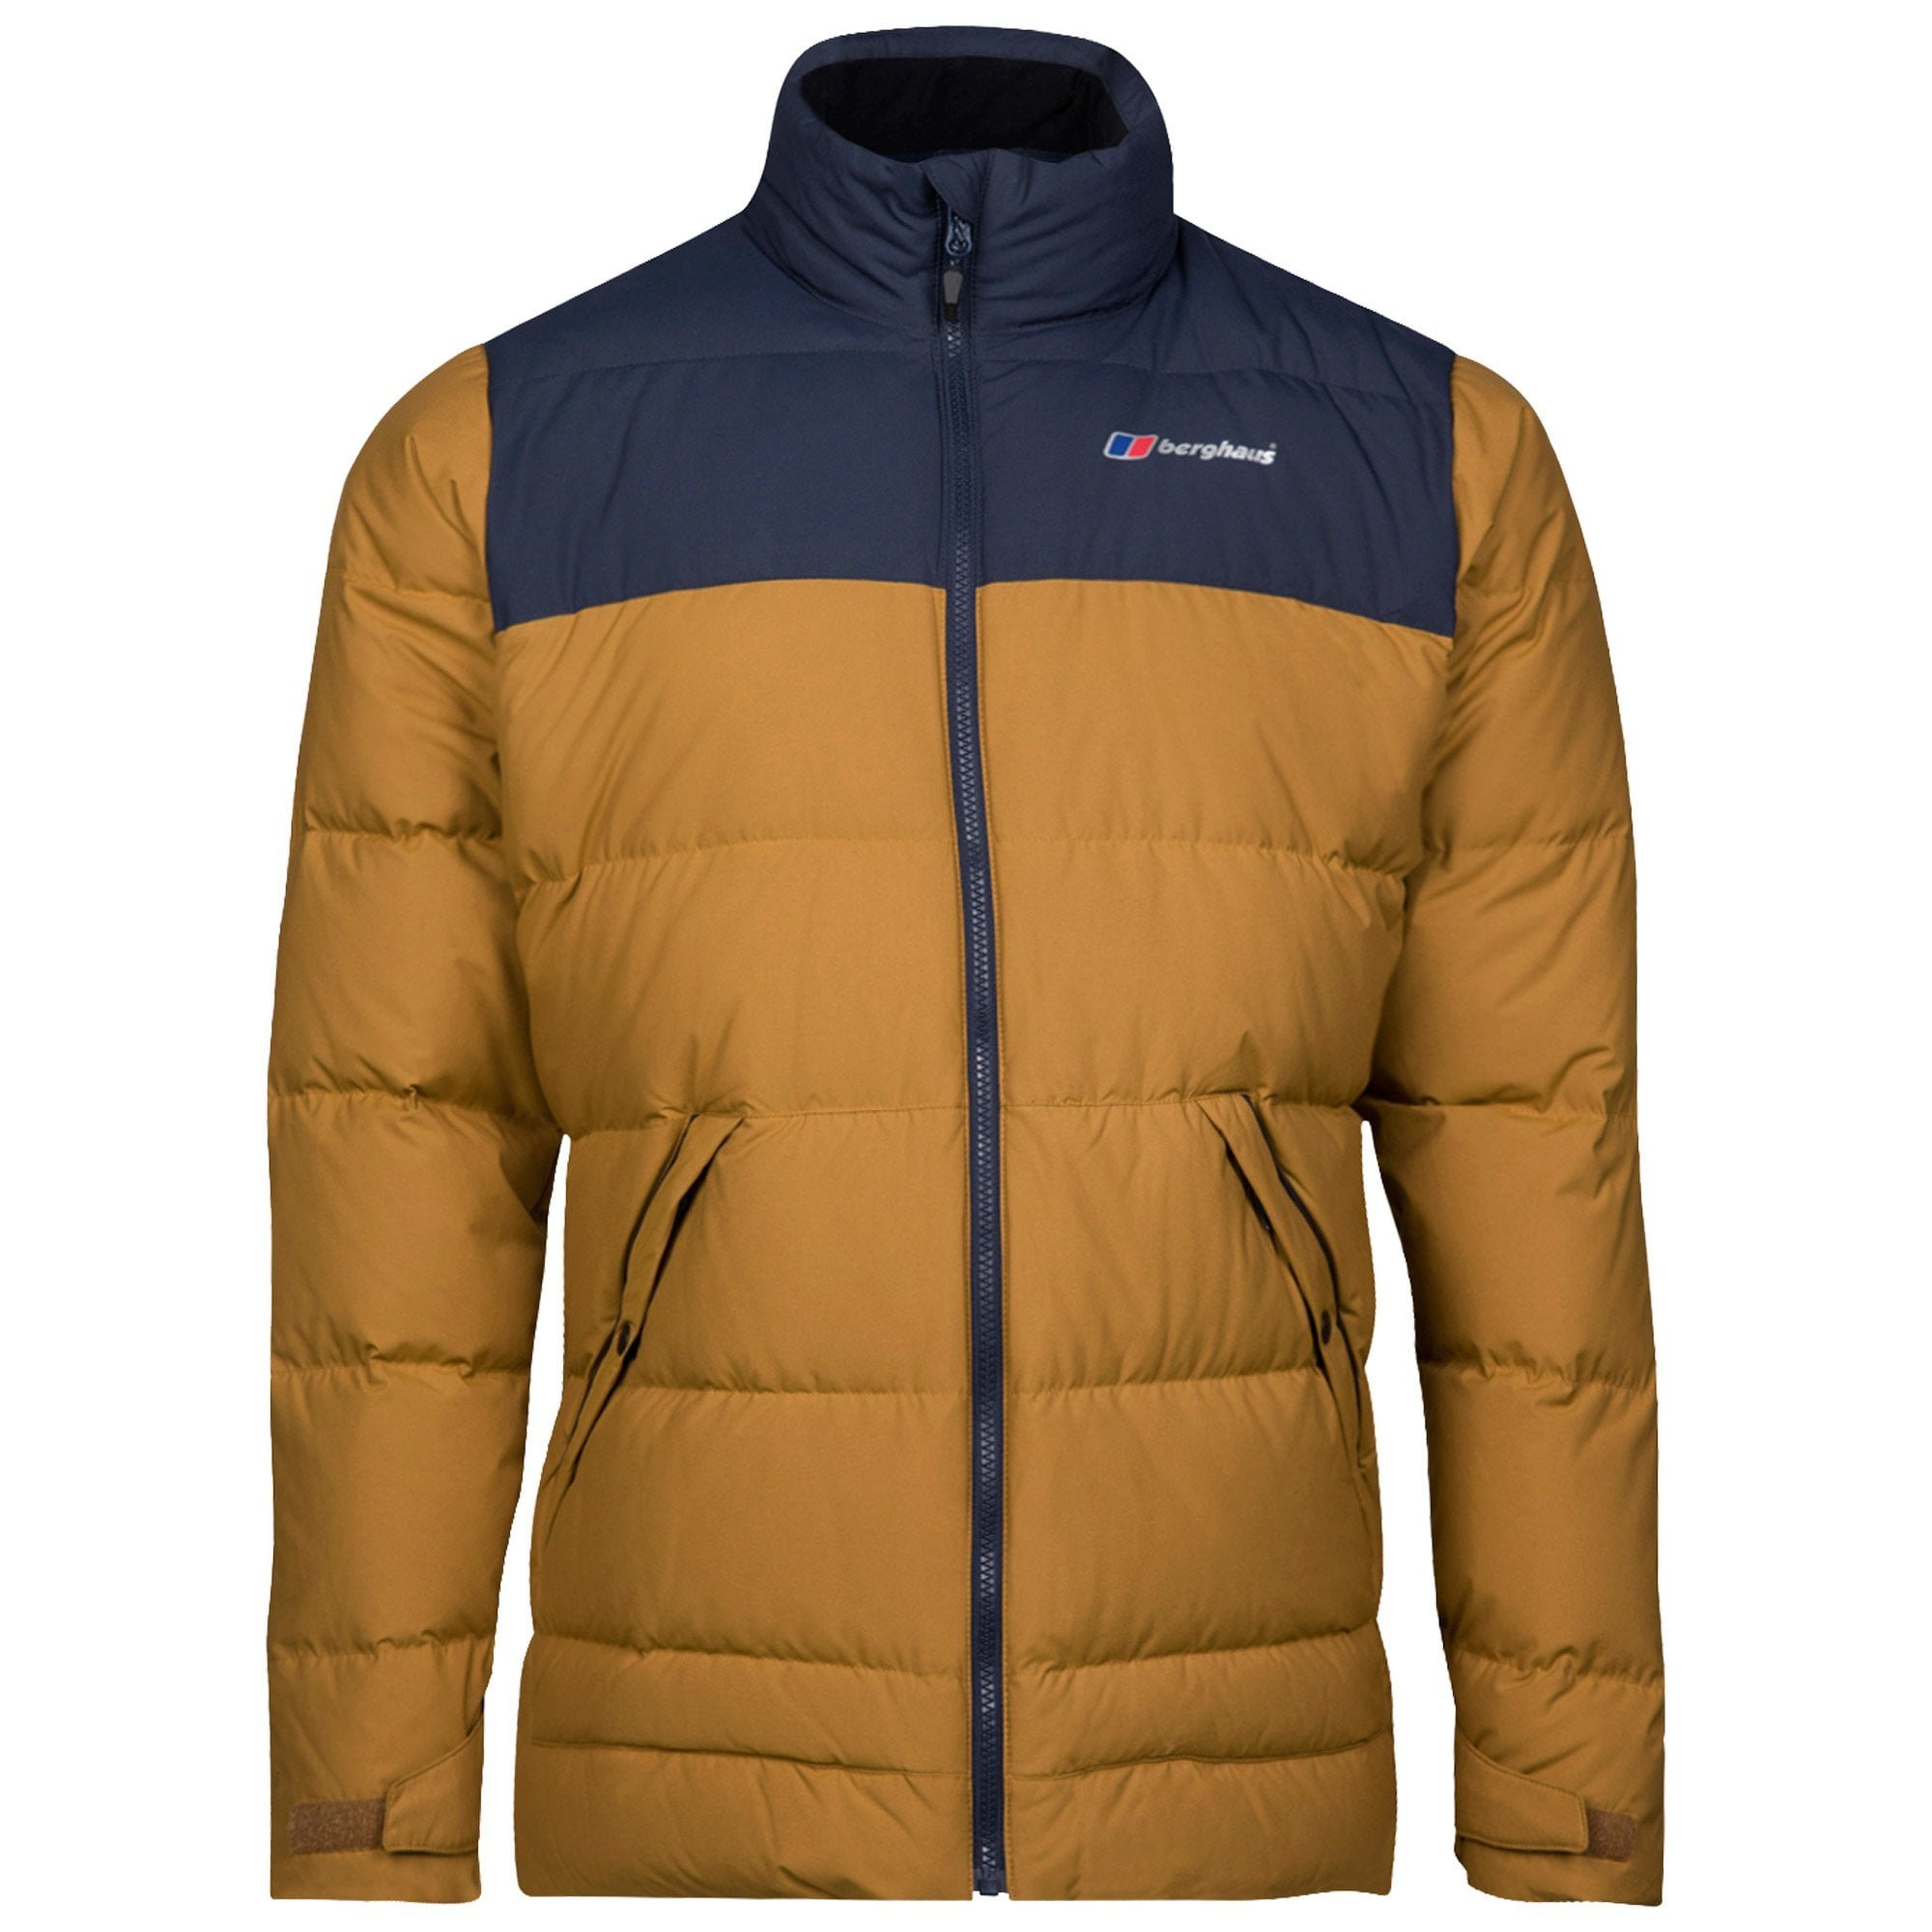 ed4507a3e80d Berghaus Men s Mavora Down Jacket - UKsportsOutdoors